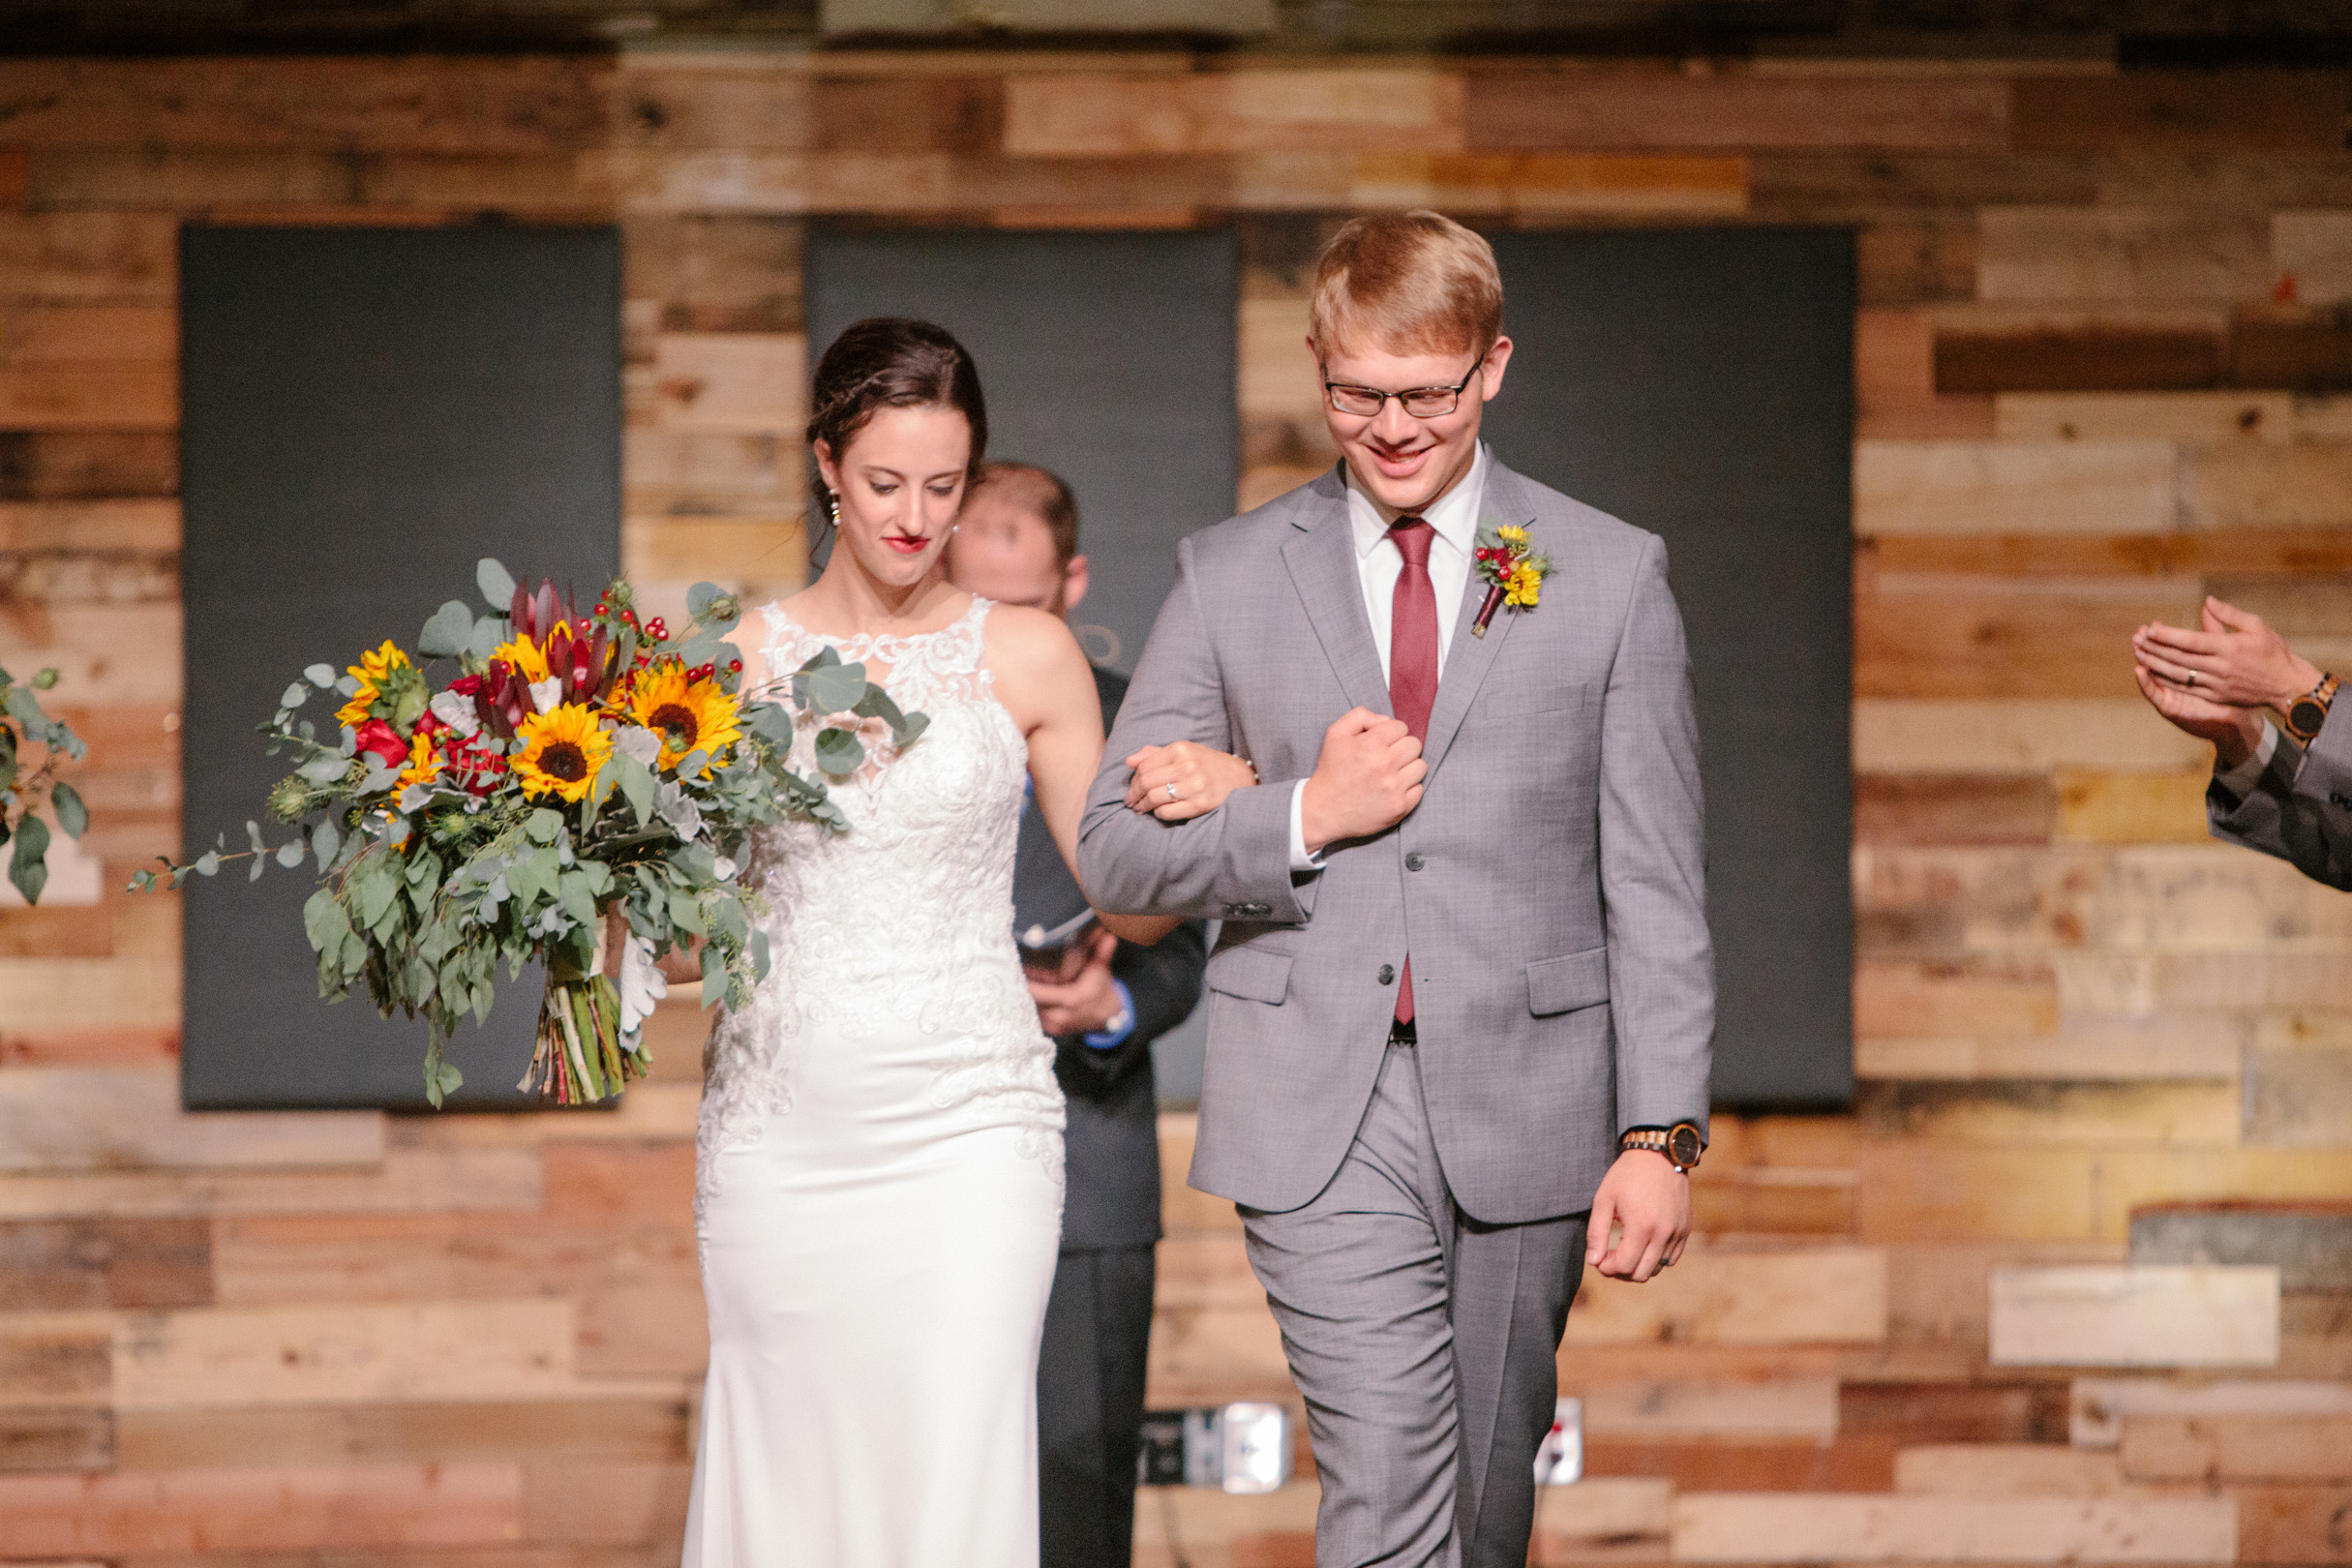 gabby_david_the_chateau_white_oak_wedding_029